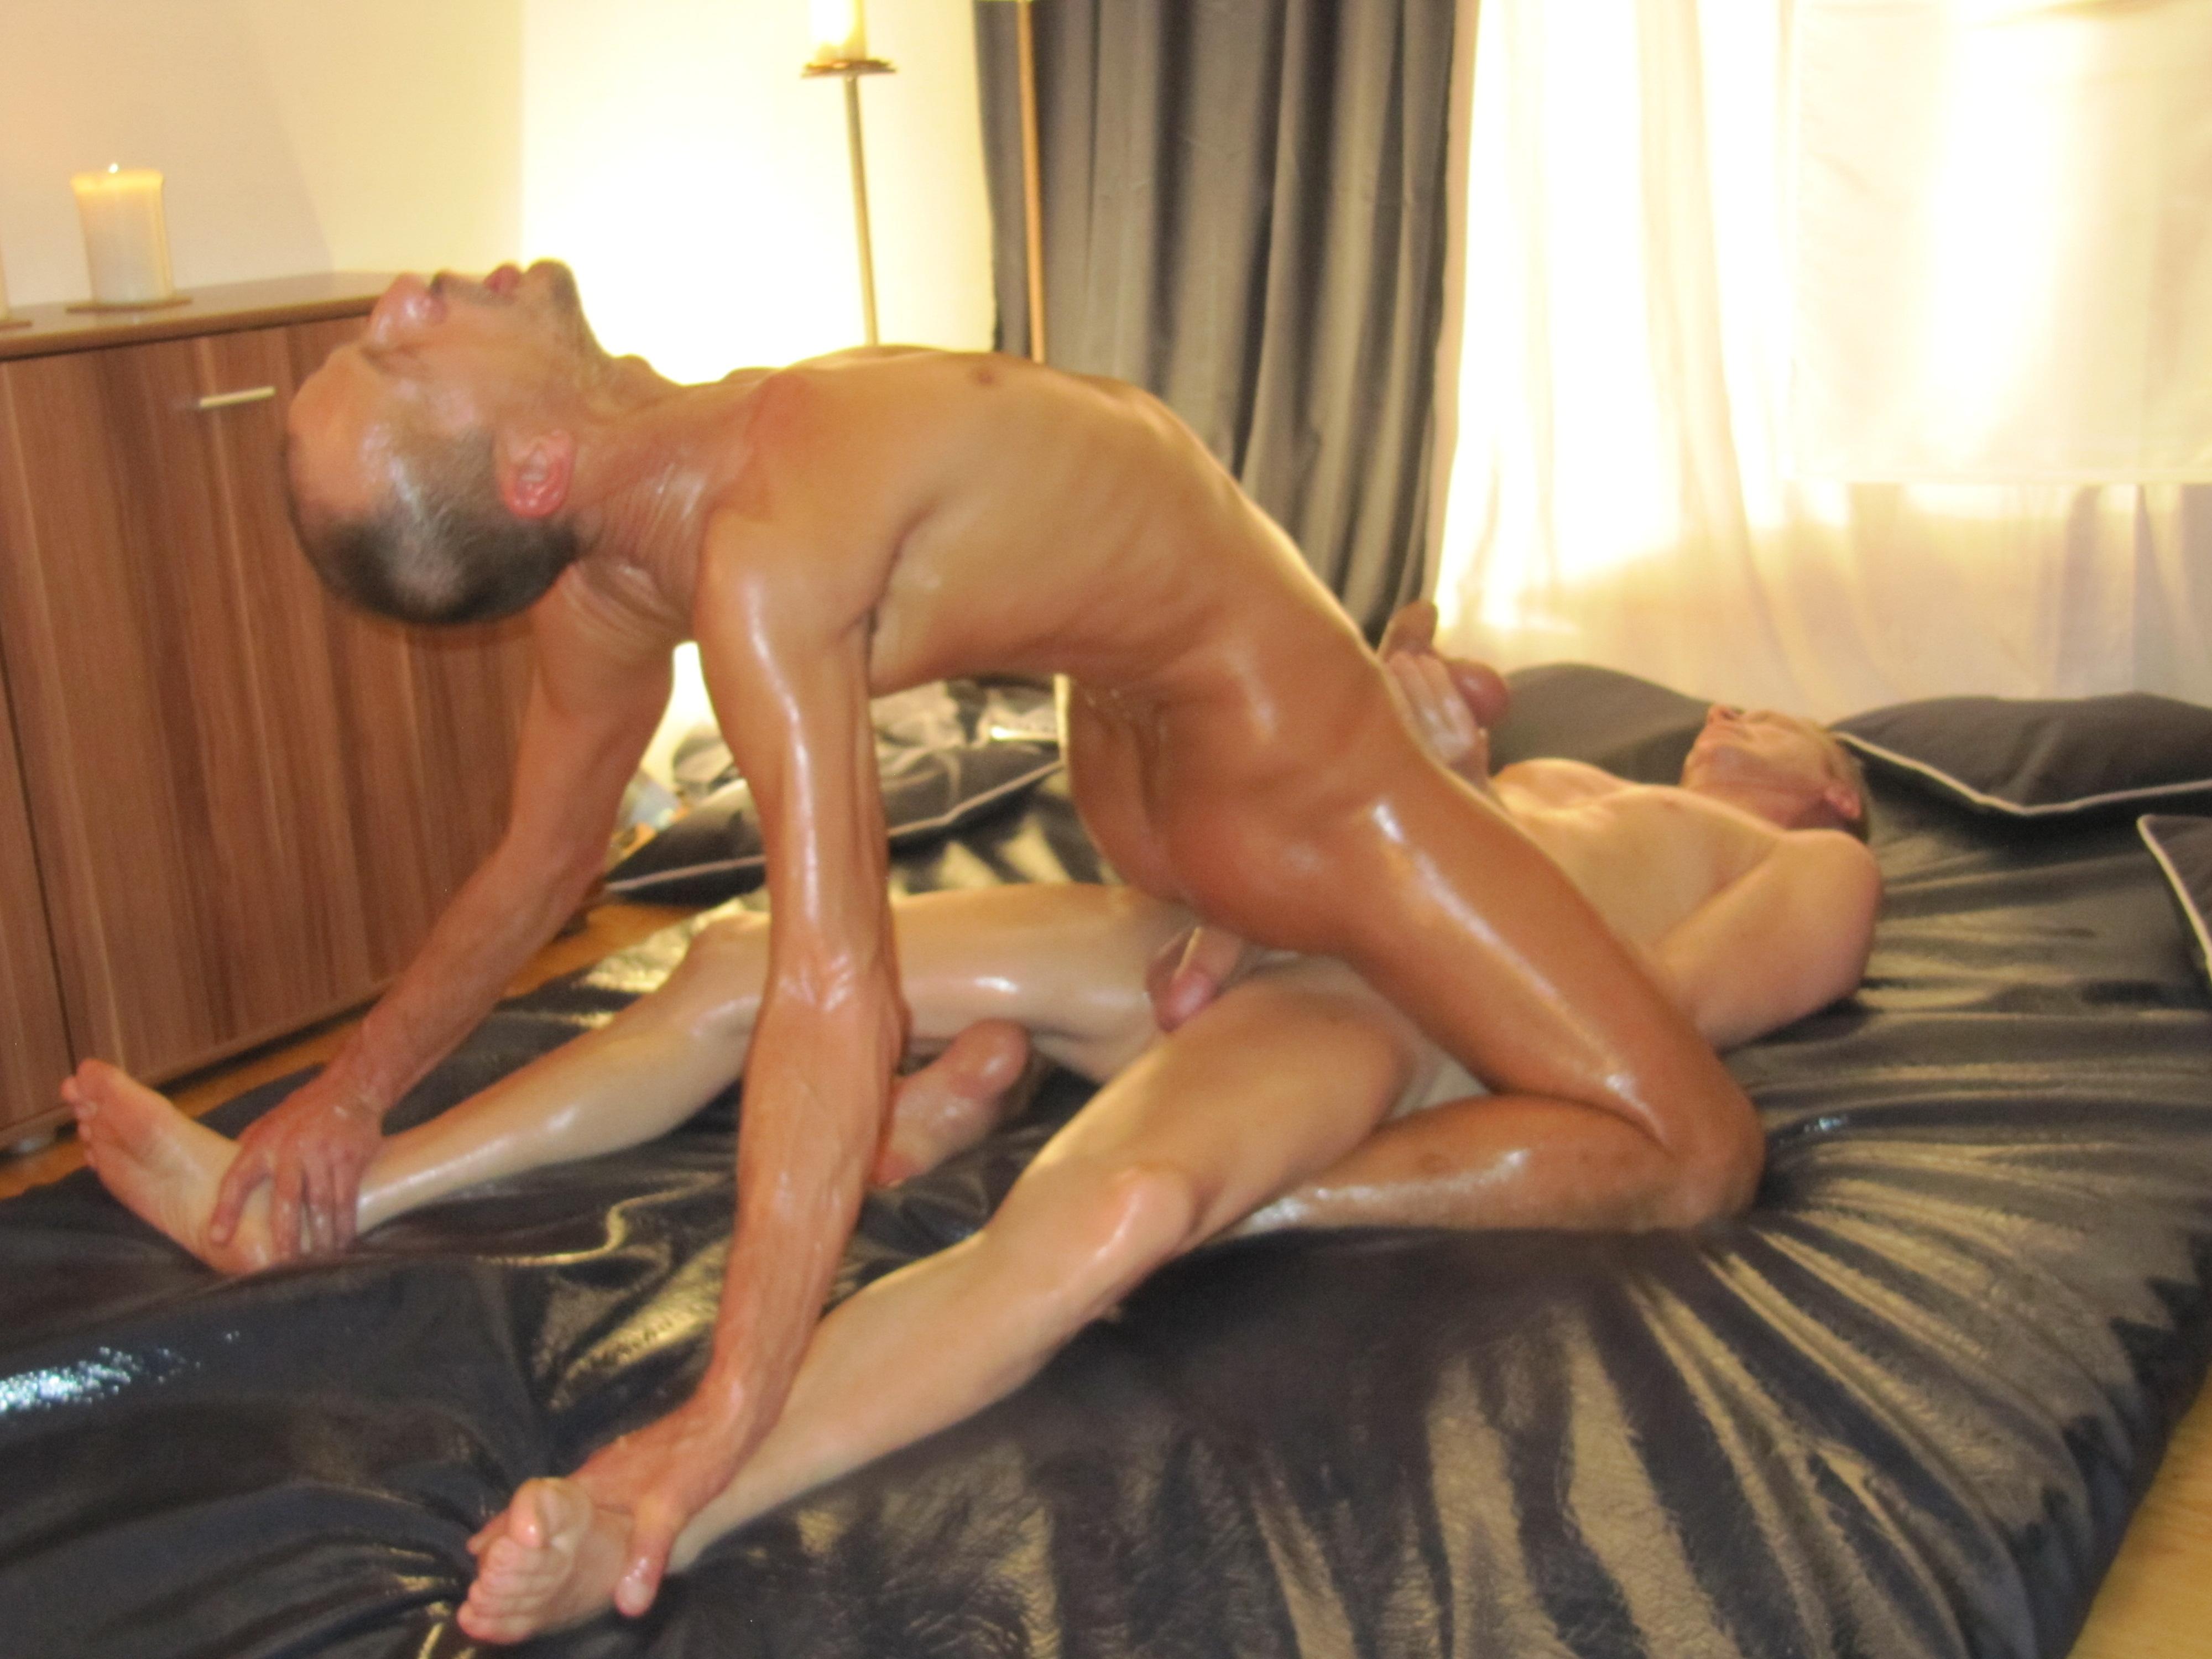 massage tempel hamburg hermaphroditismus sex